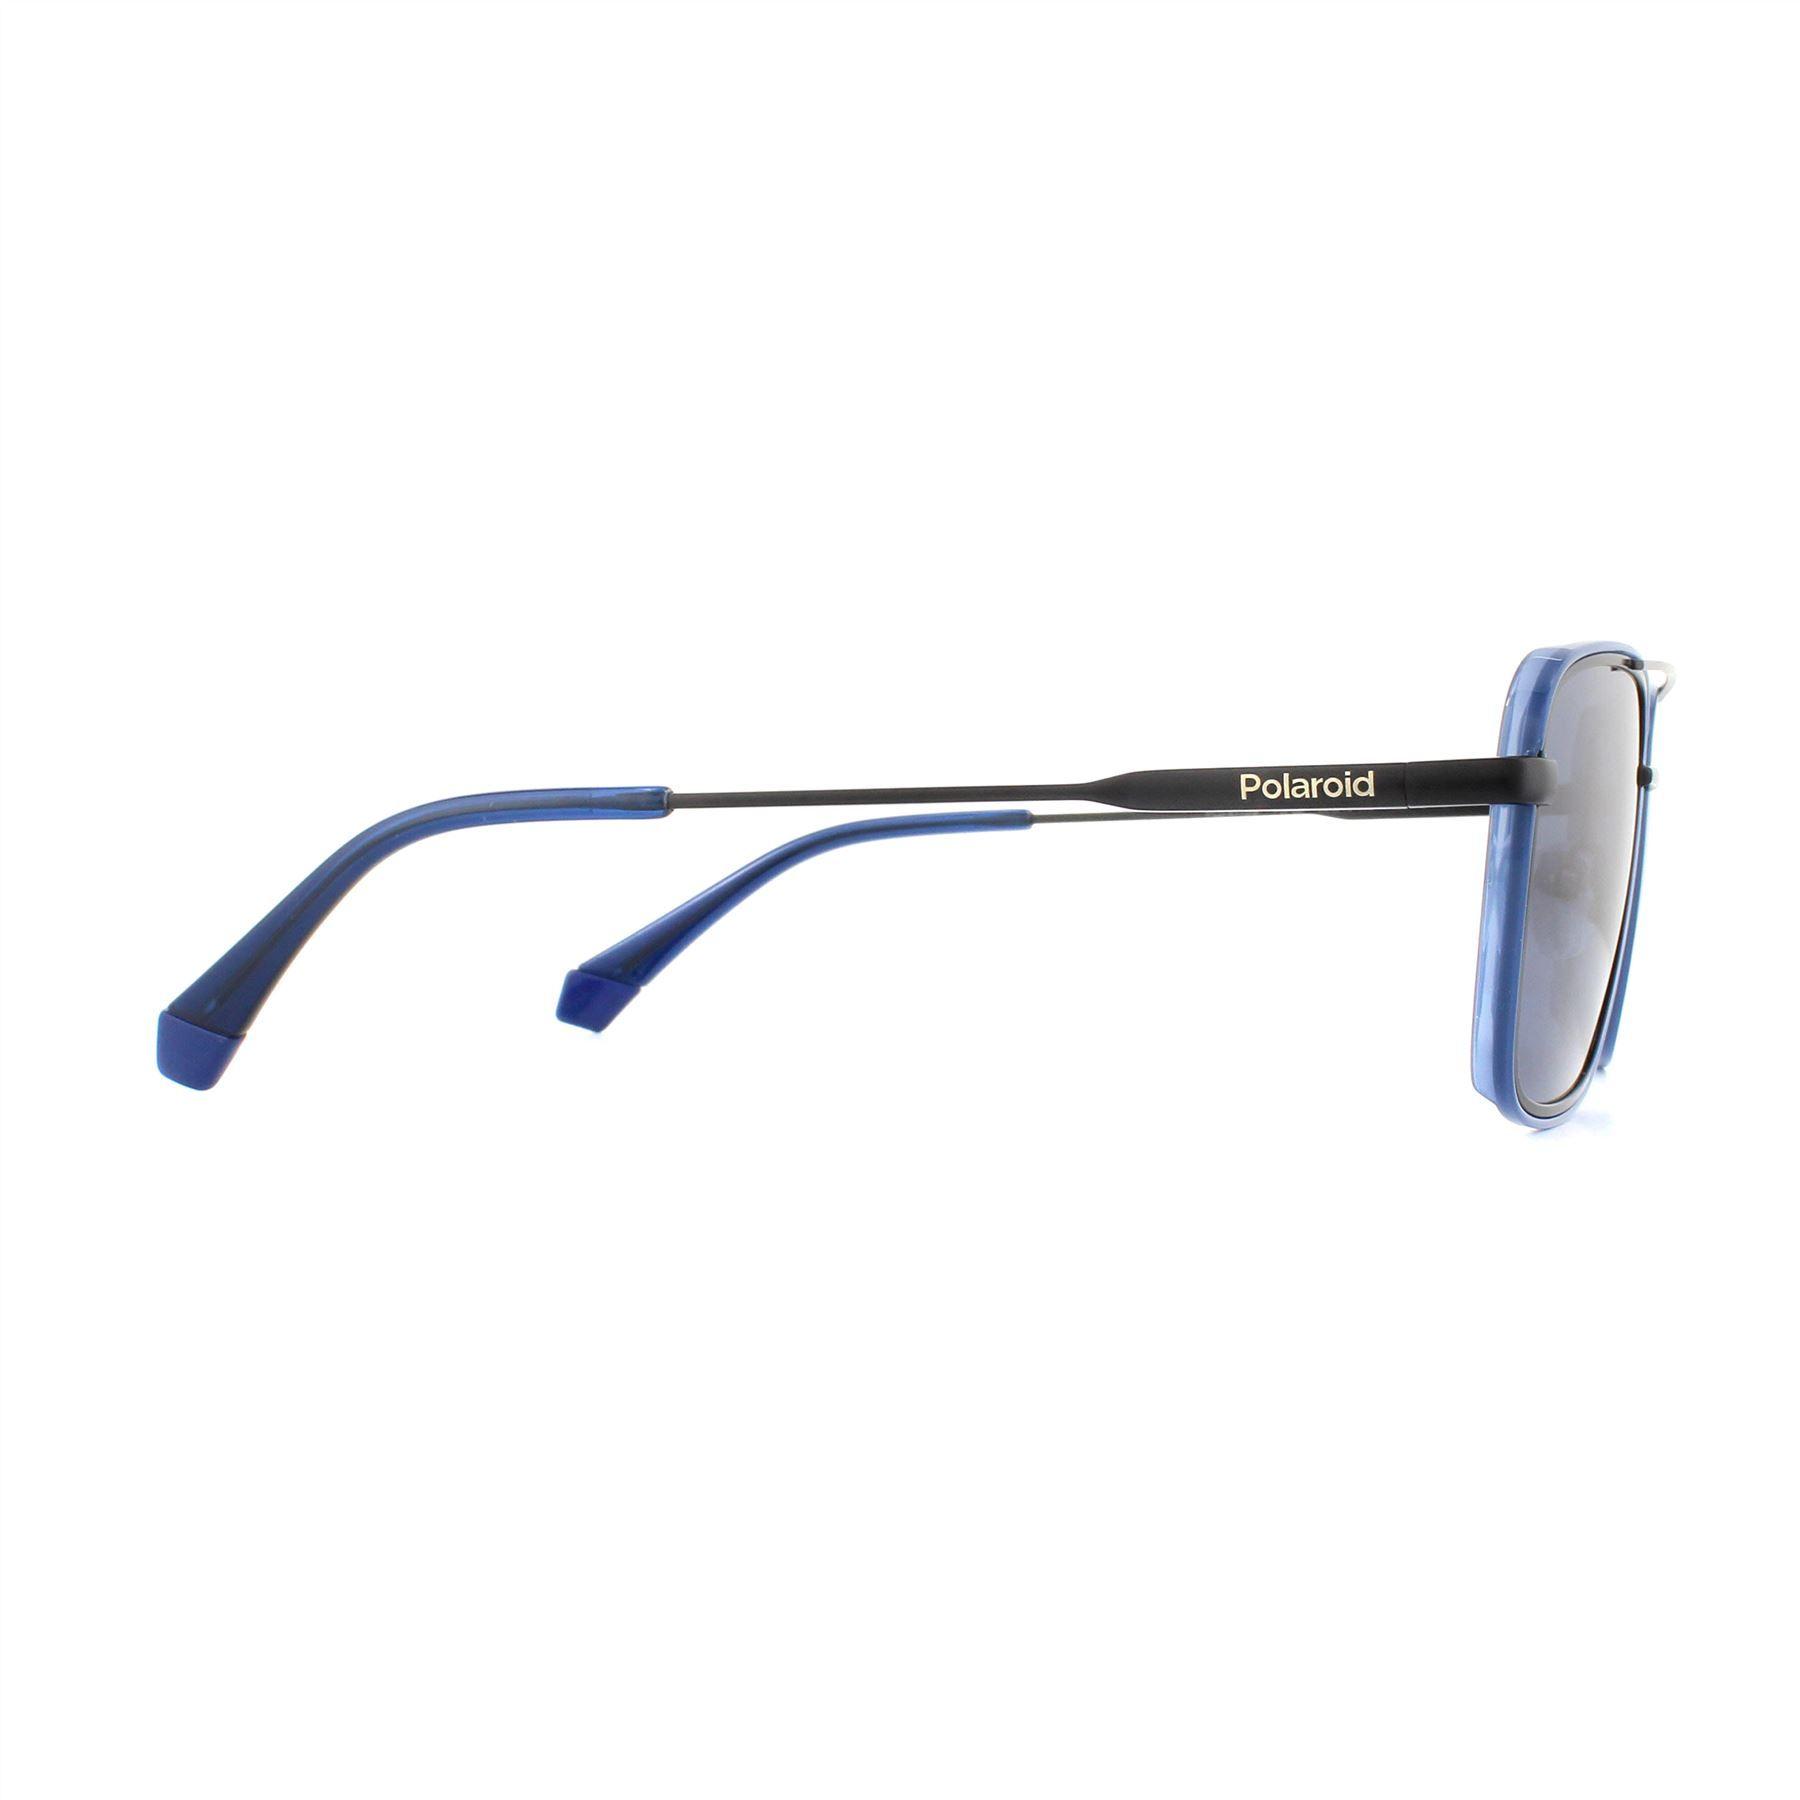 Polaroid Sunglasses 6115/S PJP C3 Blue Grey Polarized